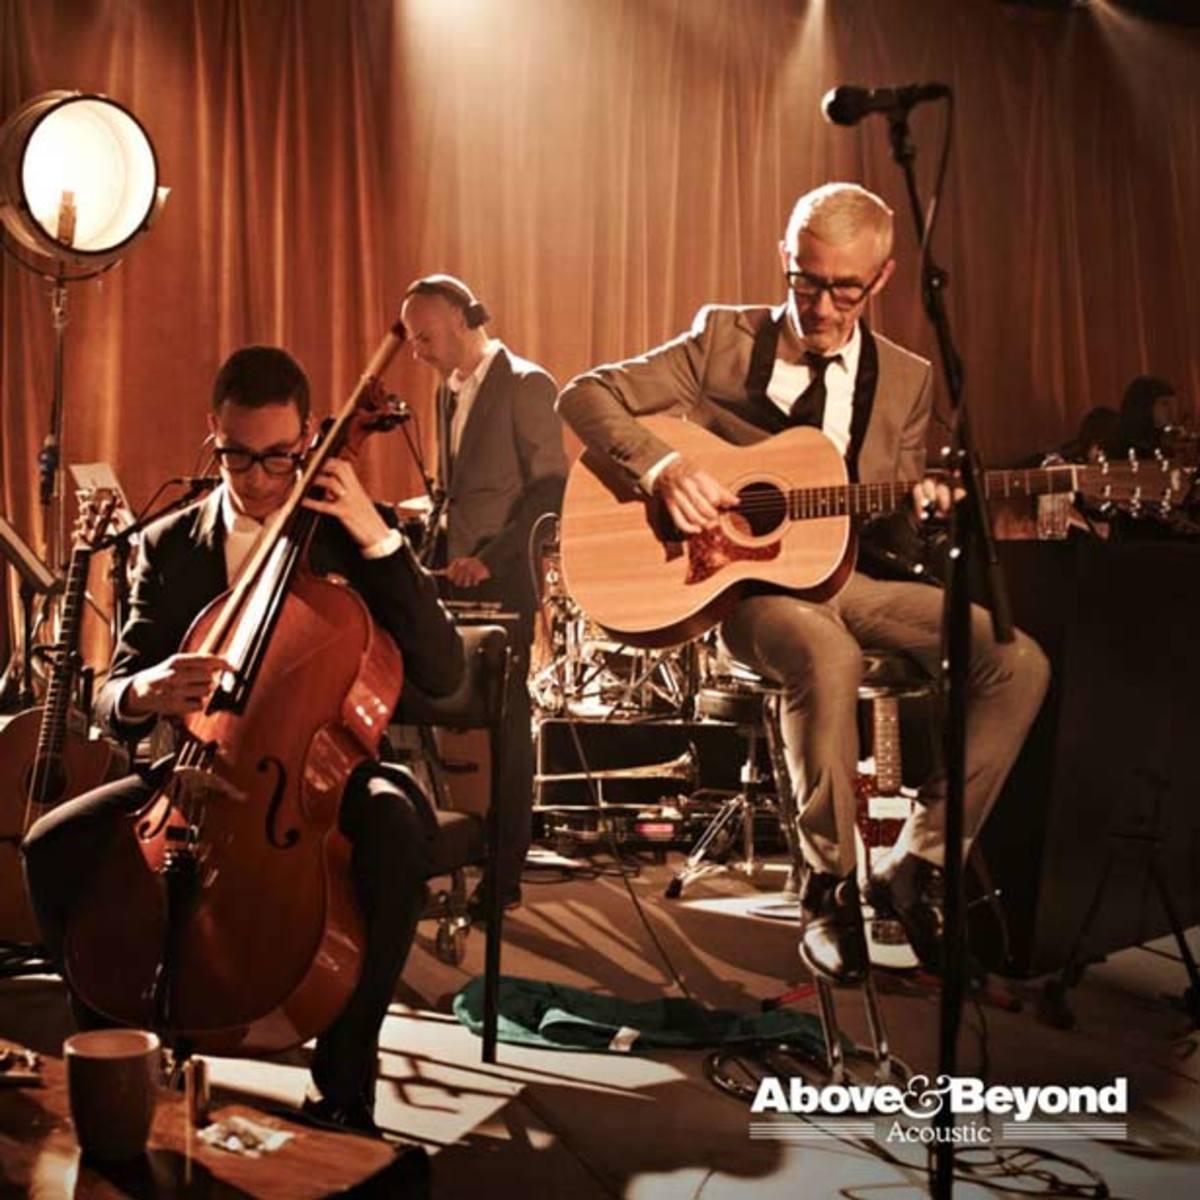 Above & Beyond Drop Acoustic Album on Anjunabeats/Ultra Today - EDM News